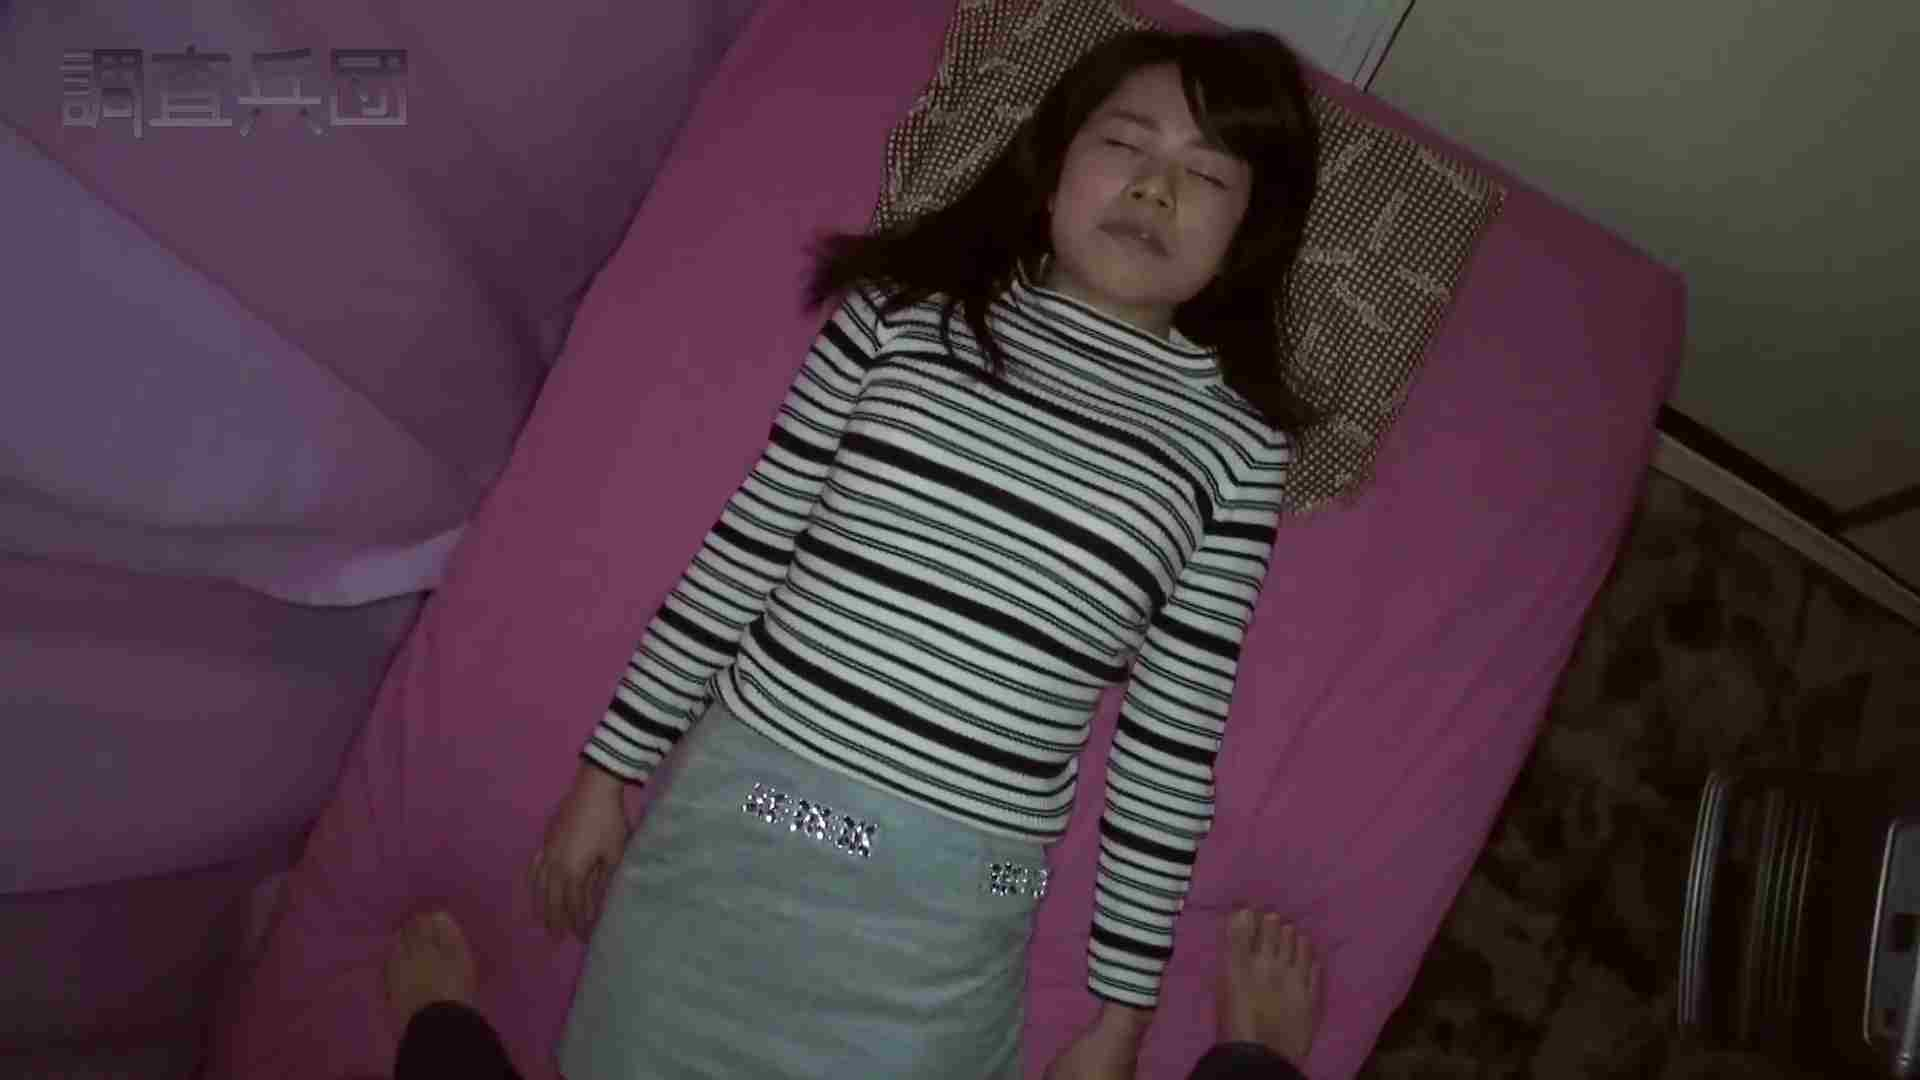 RE:~反撃の悪戯~vol.9 帰国子女の才女・みほ【前編】 OL女体 | 悪戯  40連発 1